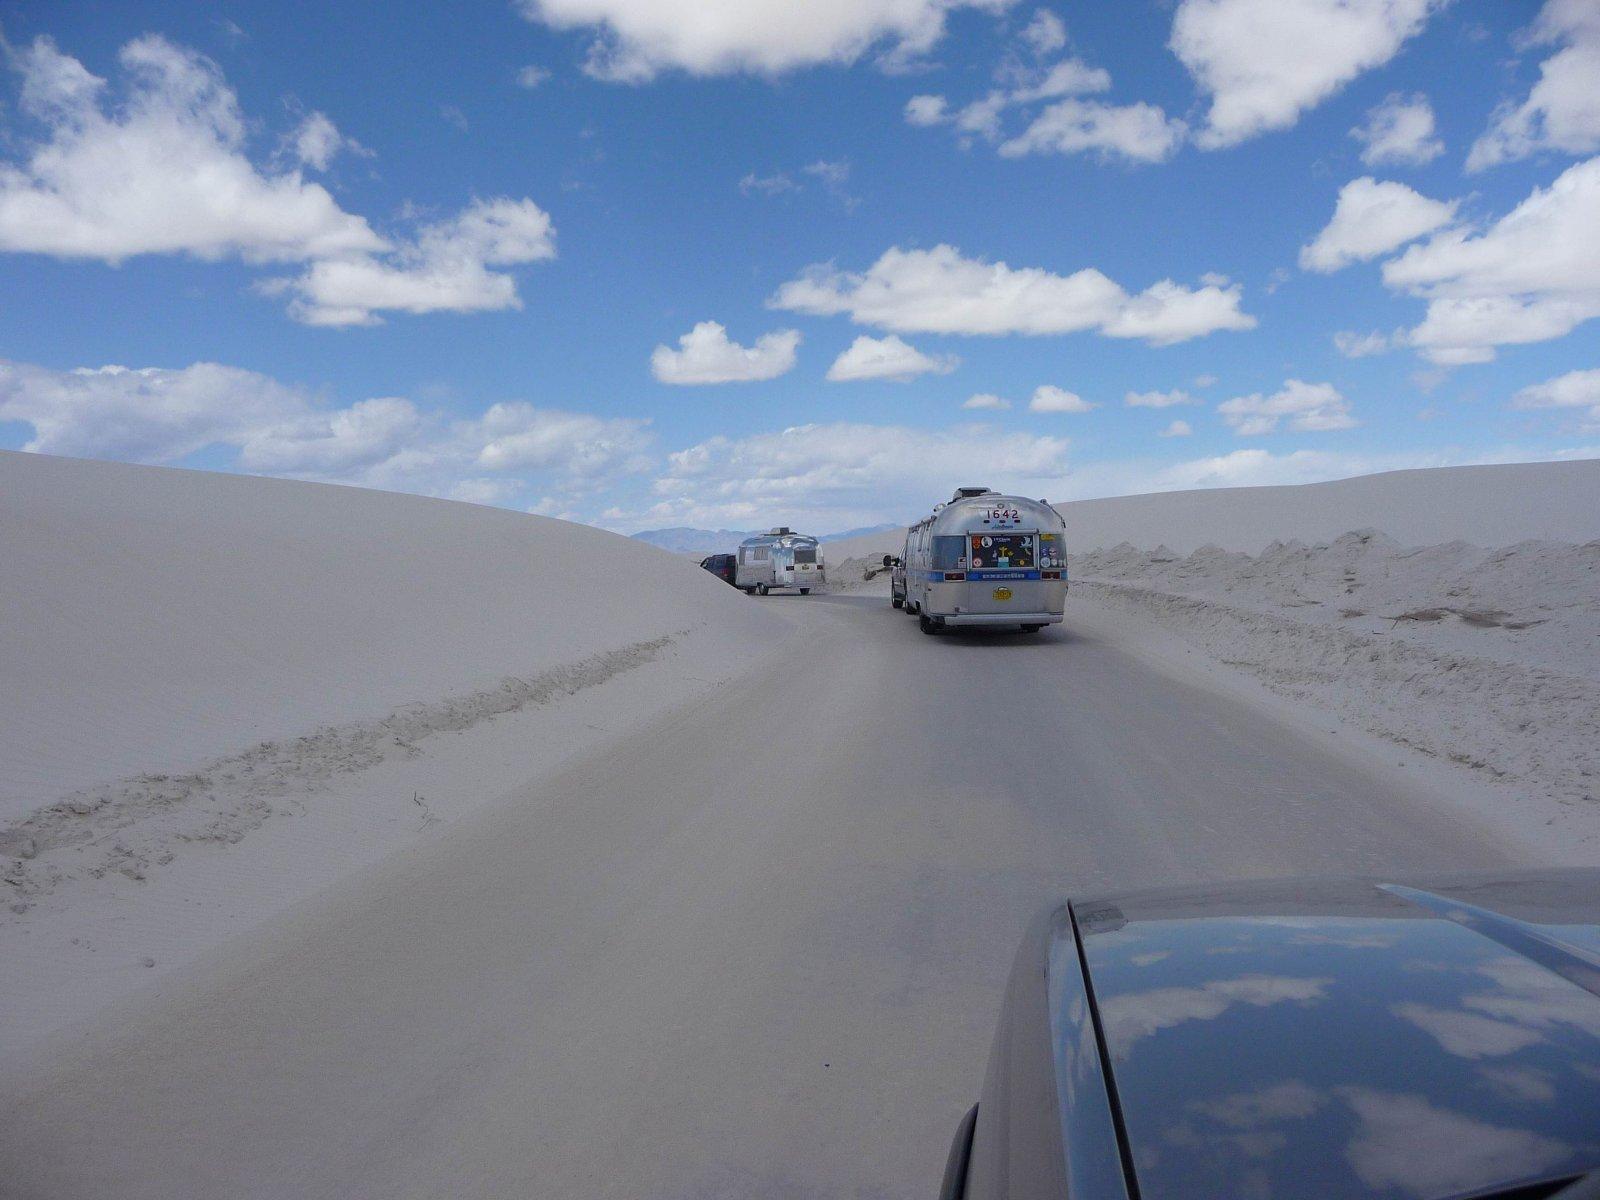 Click image for larger version  Name:White Sands Caravan 1.jpg Views:93 Size:190.8 KB ID:104062